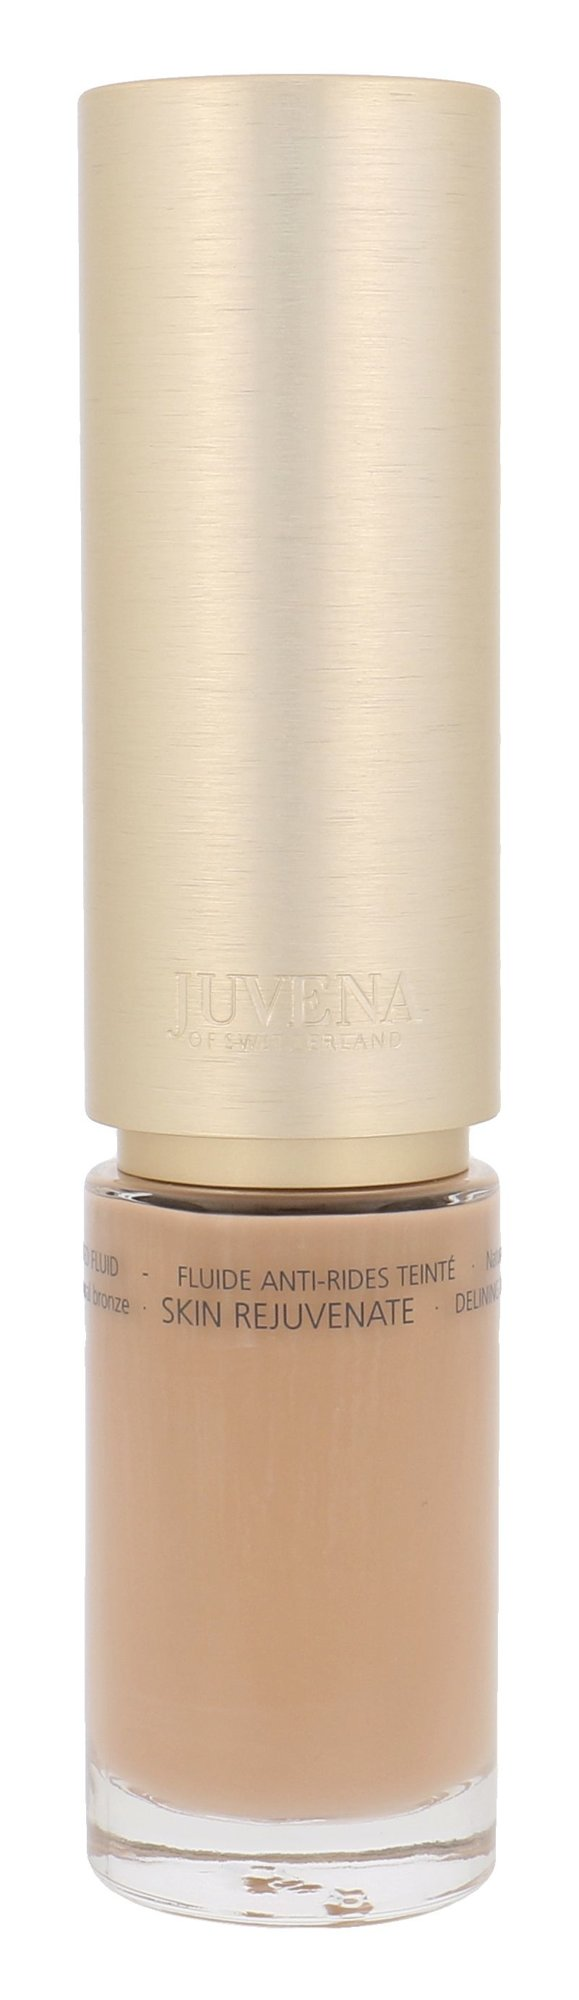 Juvena Rejuvenate & Correct Tinted Fluid Bronze SPF10